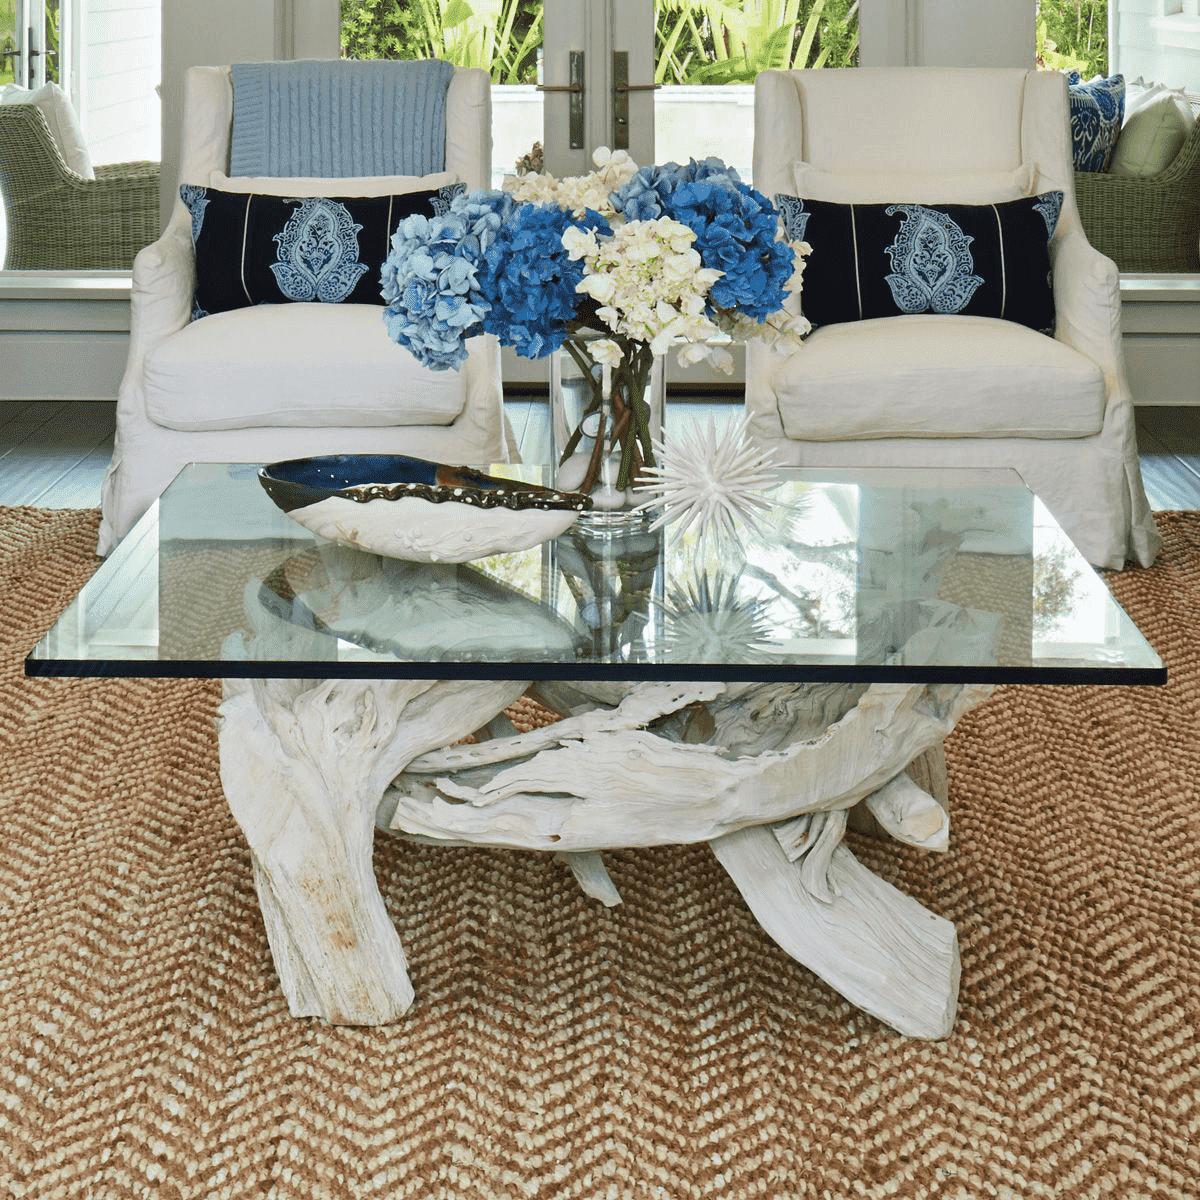 Hampton Driftwood Coffee Table Base To Accommodate 60 Square Glass Top Coffee Table Driftwood Coffee Table Living Room Coffee Table [ 1200 x 1200 Pixel ]